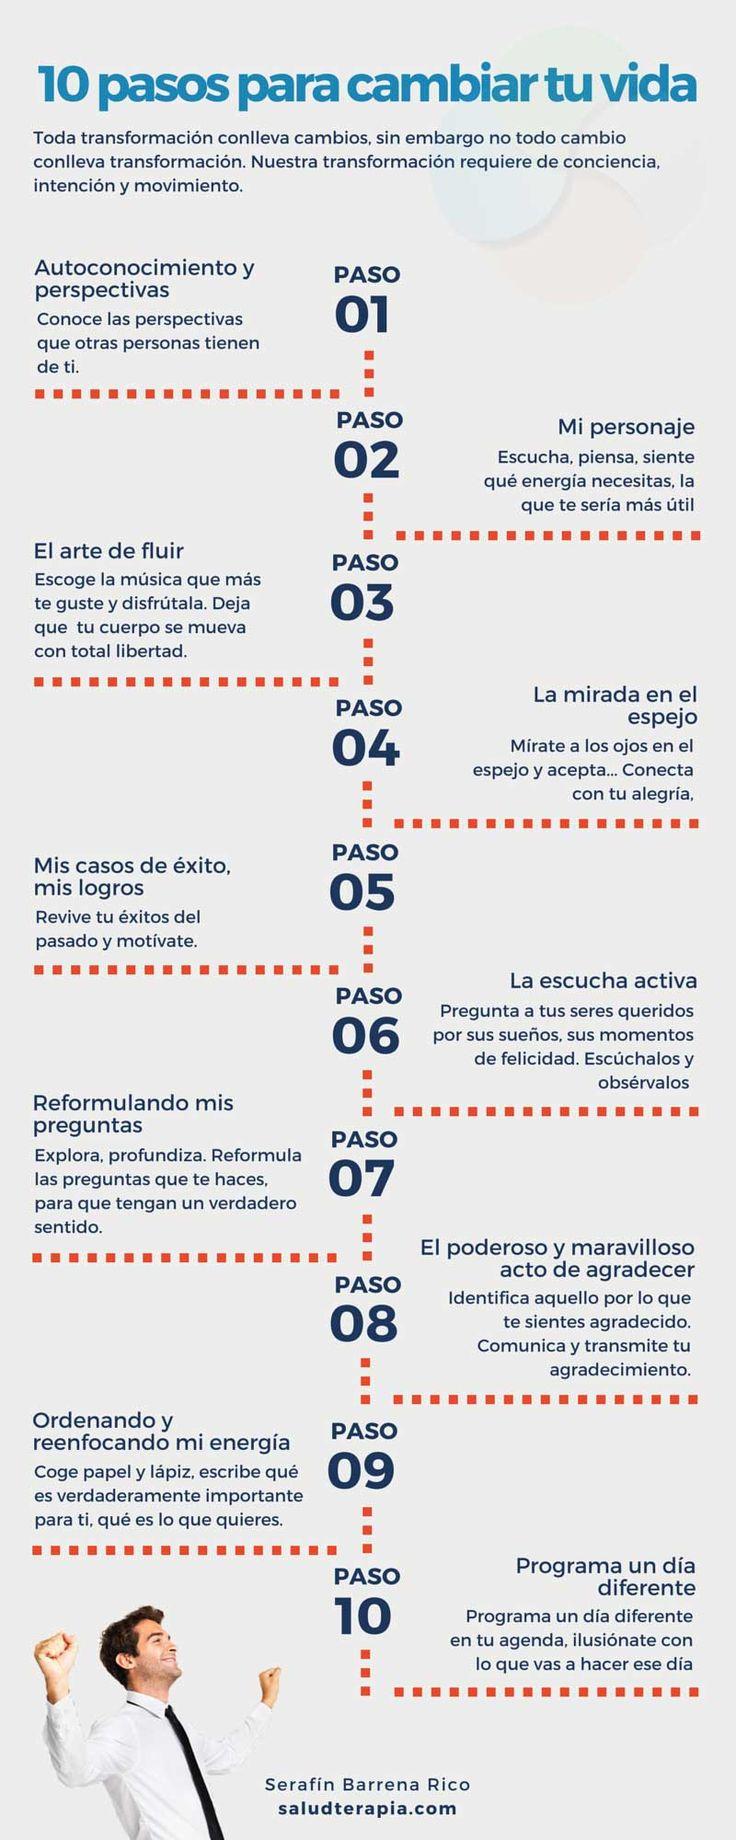 10 pasos cambiar vida - infográfico